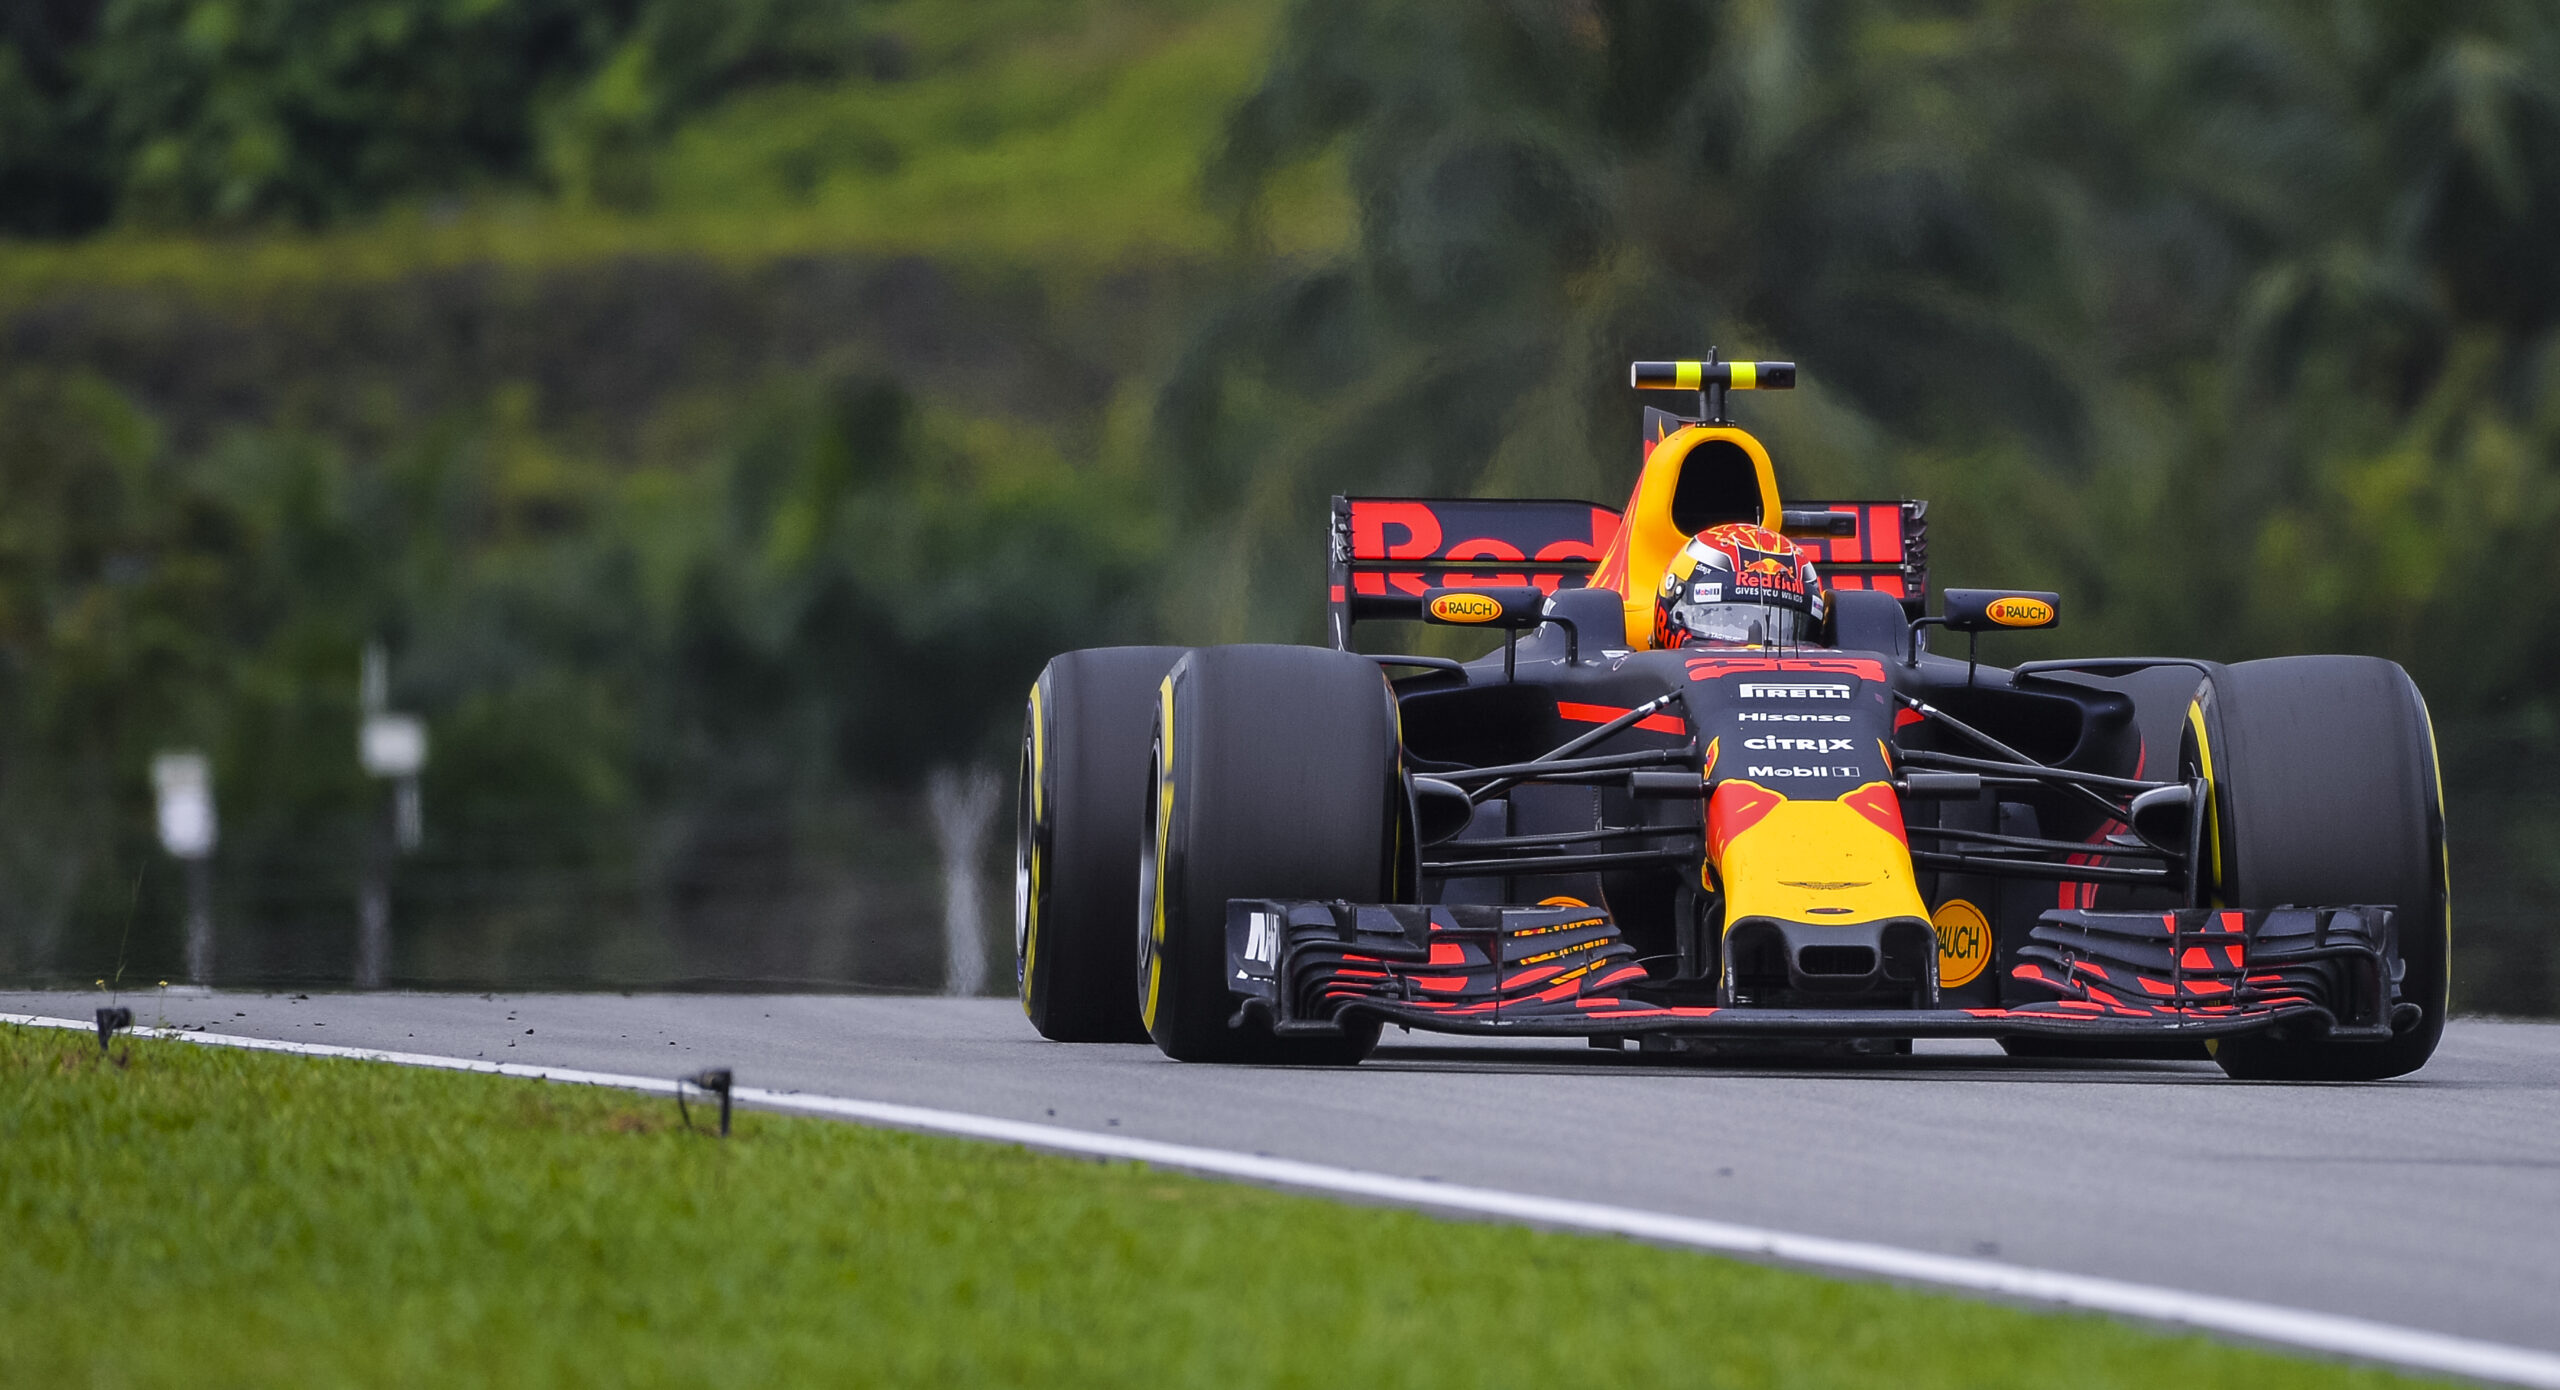 F1 Grand Prix België tips